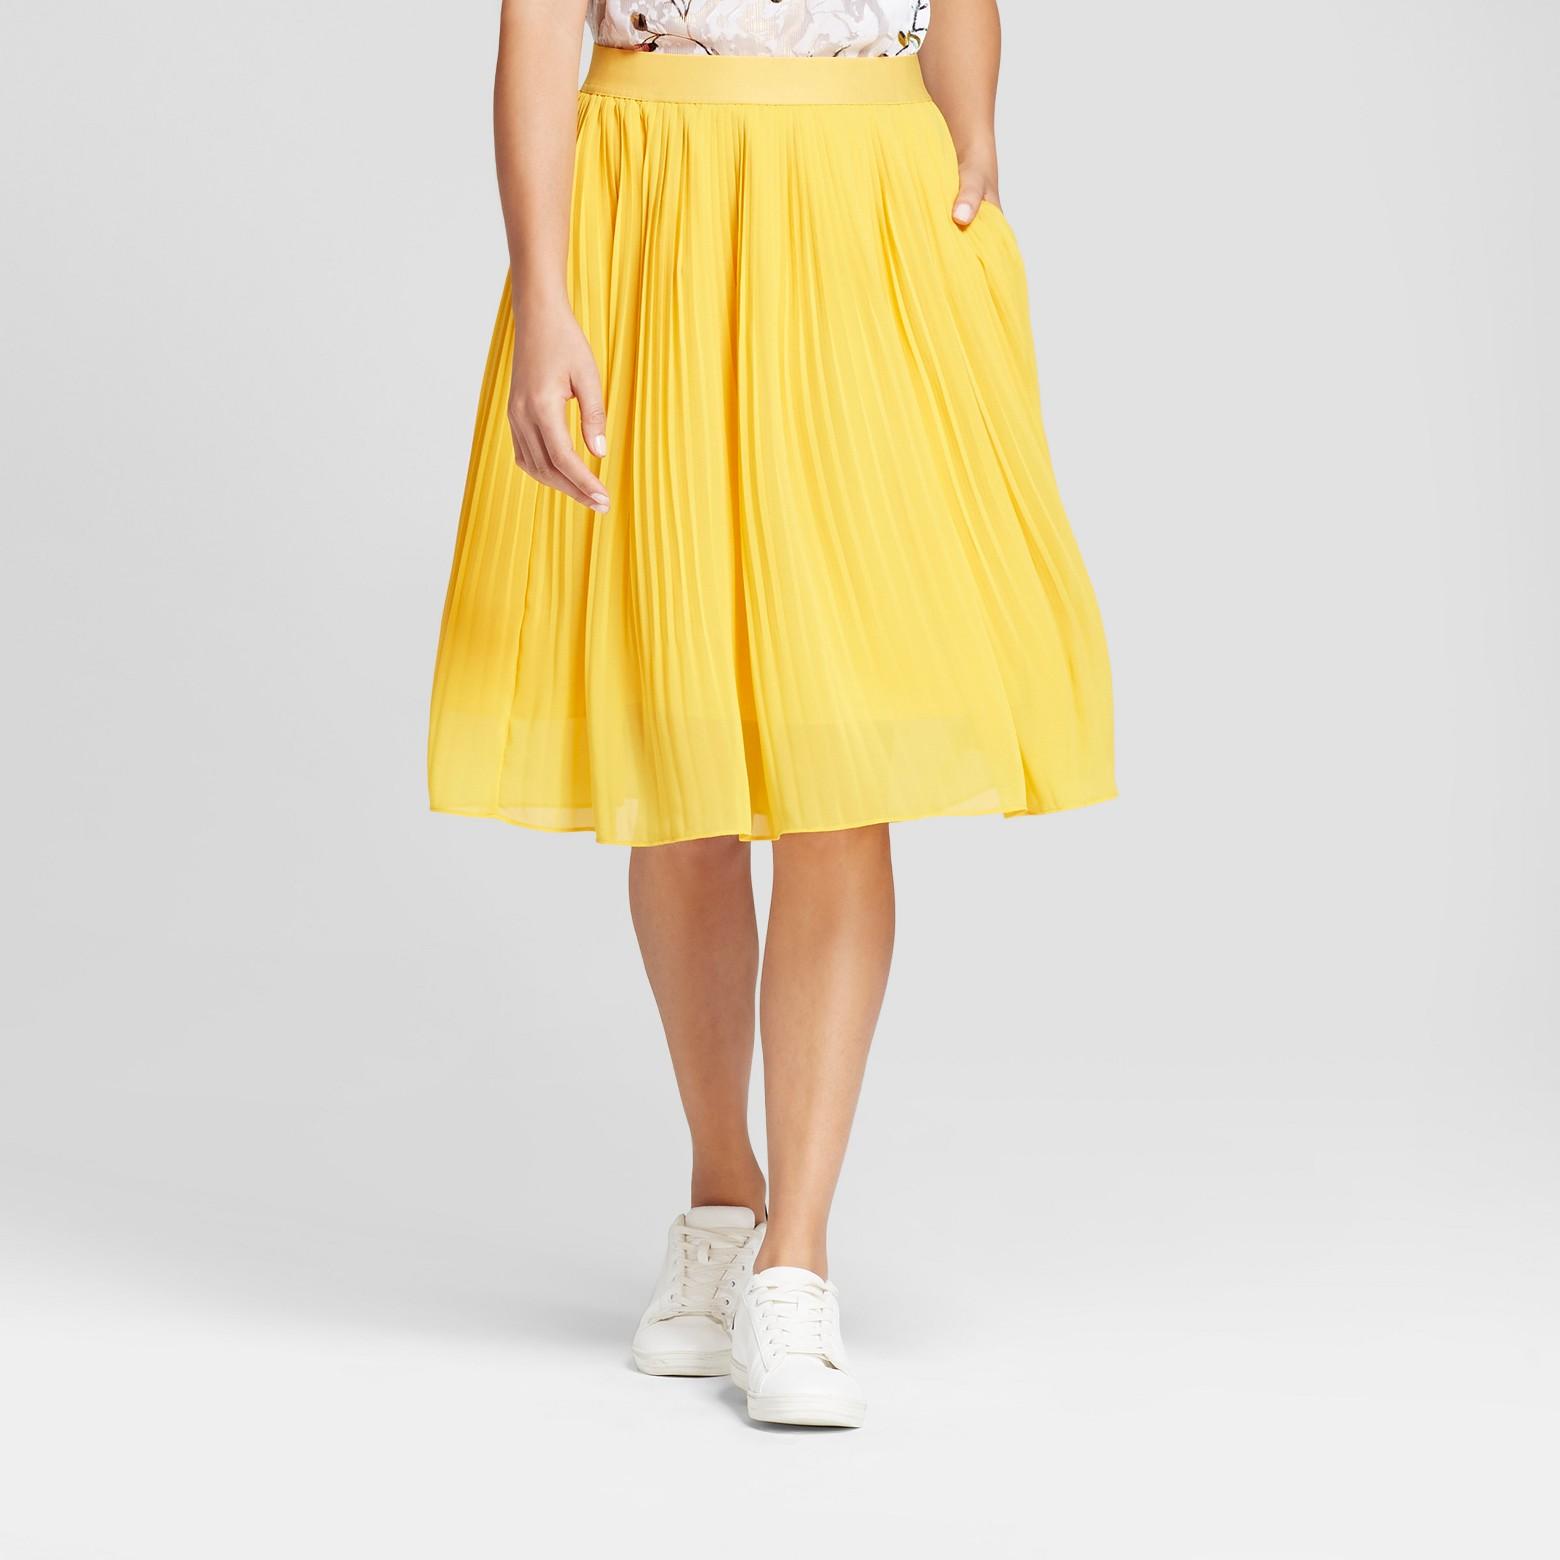 target yellow skirt